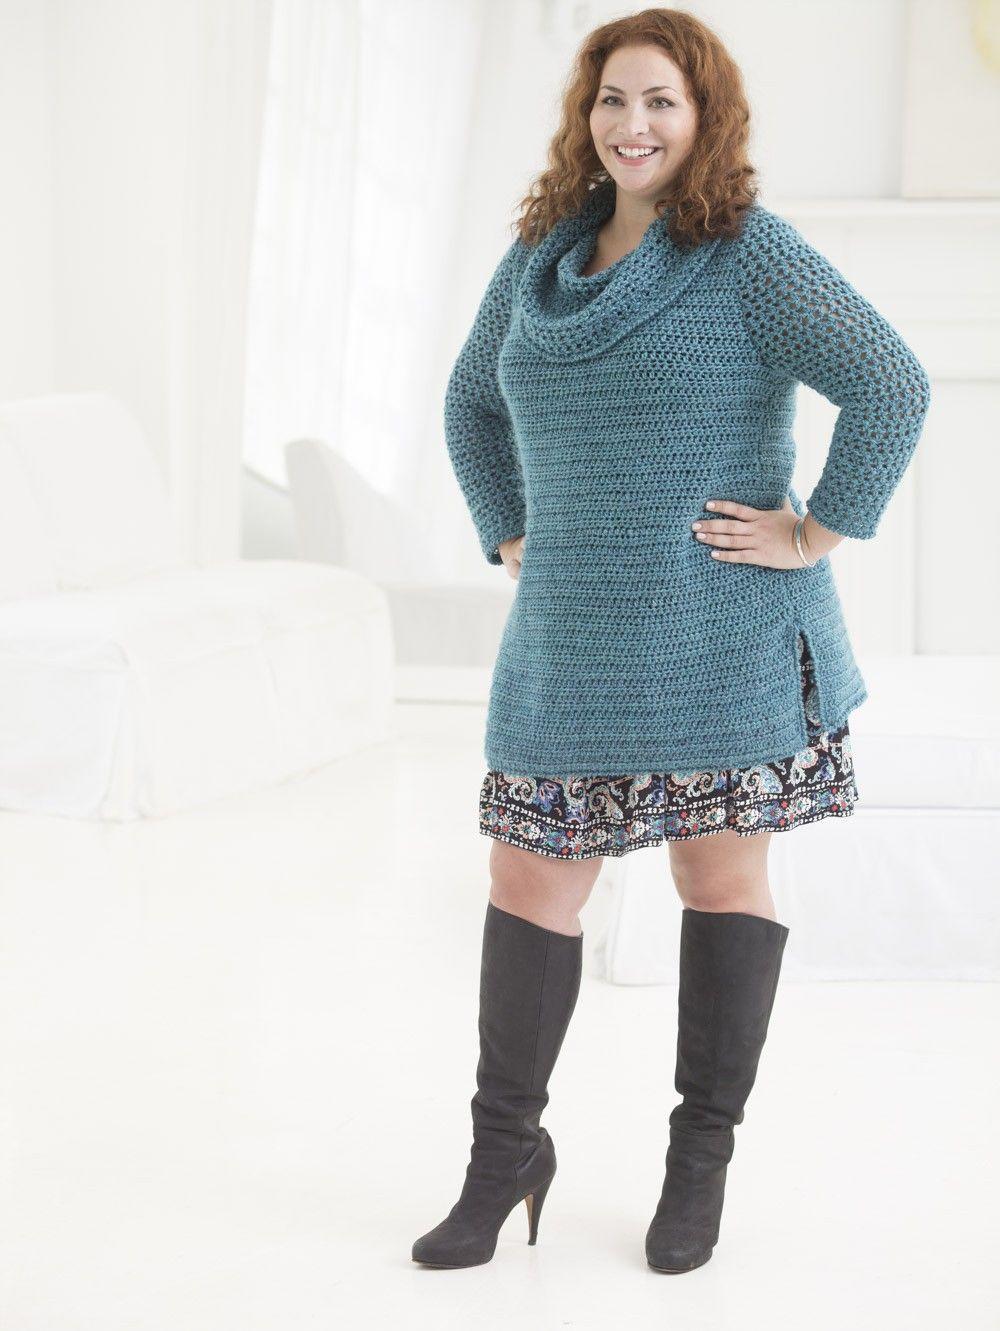 Curvy Girl Crochet Tunic (Crochet)   Idées : crochet   Pinterest ...